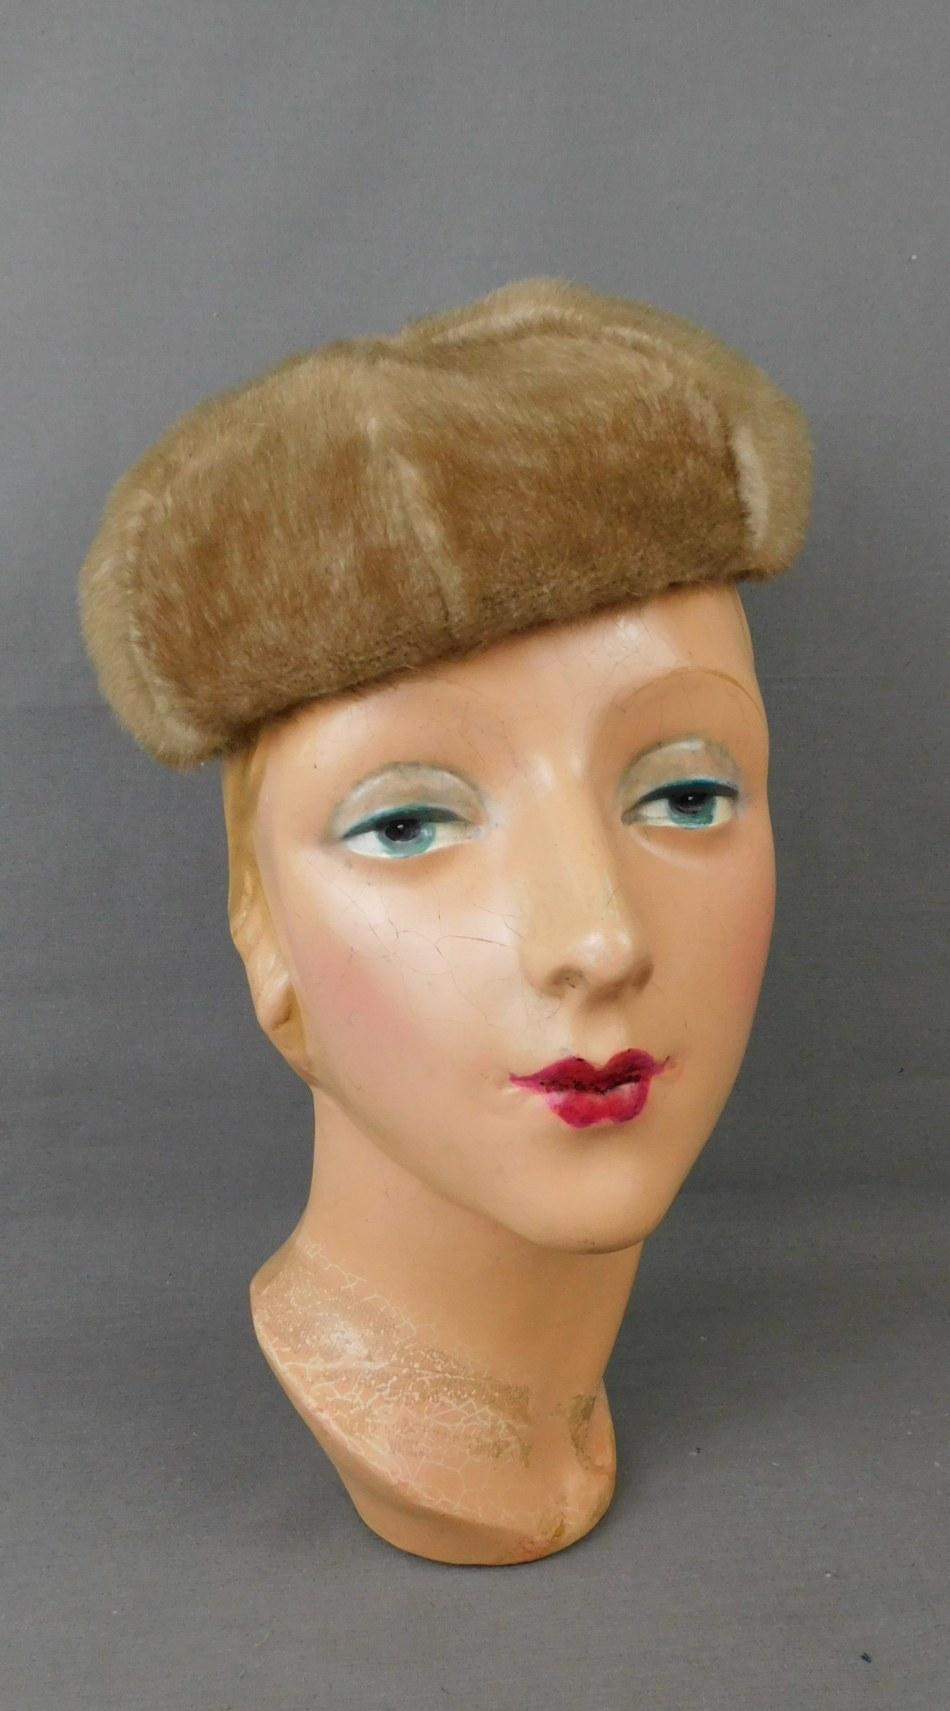 Vintage Faux Mink Fur Hat 1960s, Beret or Beanie style, Betmar, 21 inch head